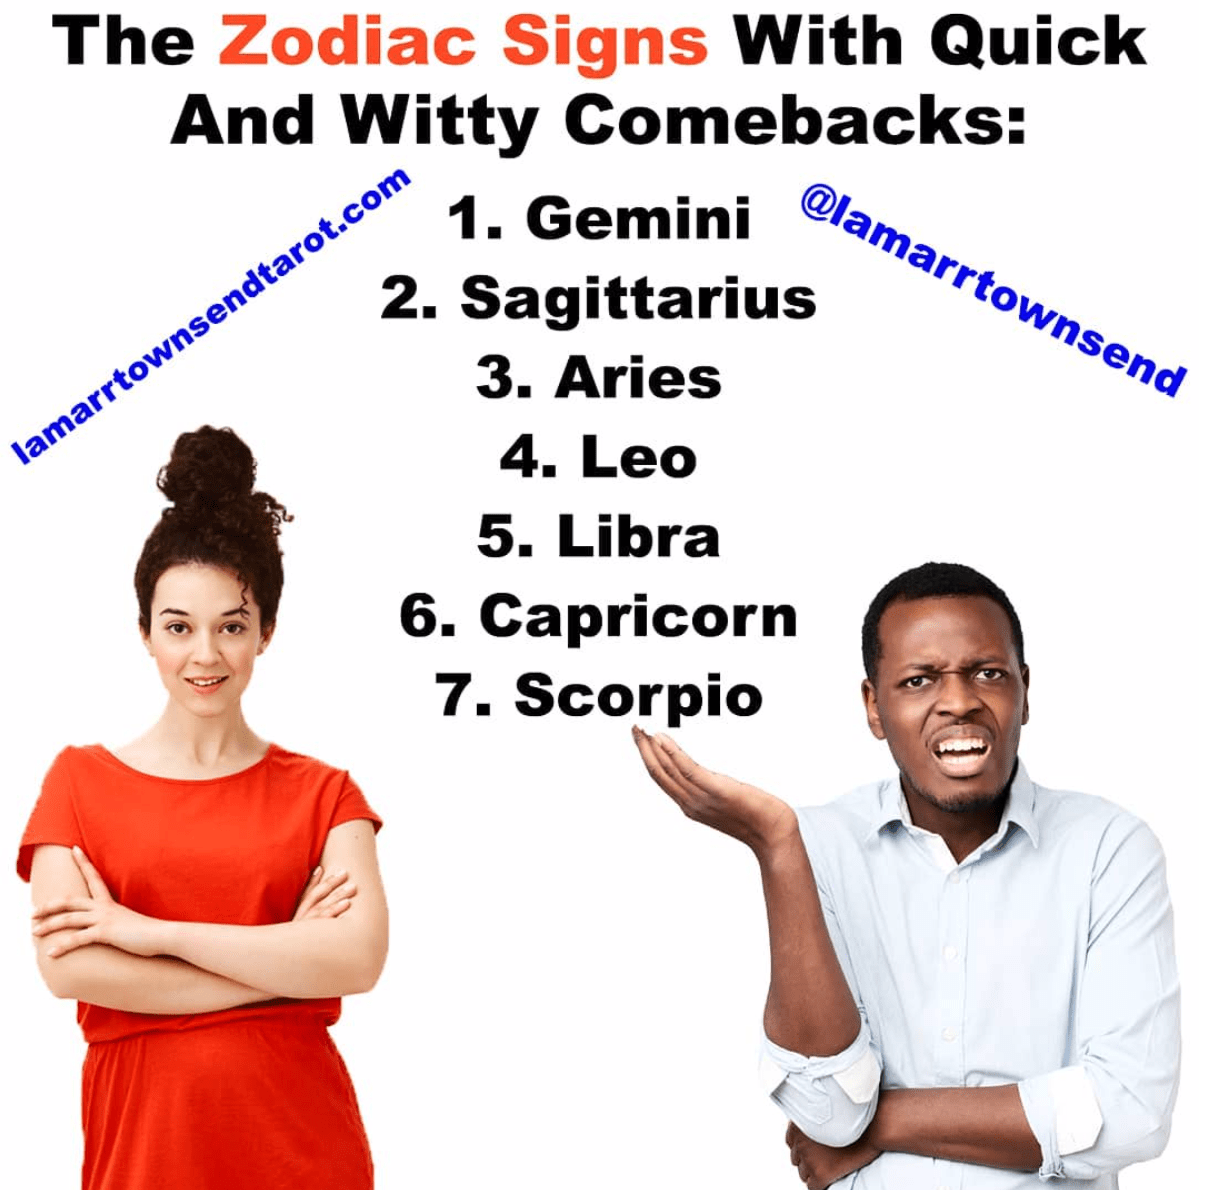 astrology meme, zodiac sign meme, gemini meme, sagittarius meme, aries meme, leo meme, libra meme, capricorn meme, scorpio meme